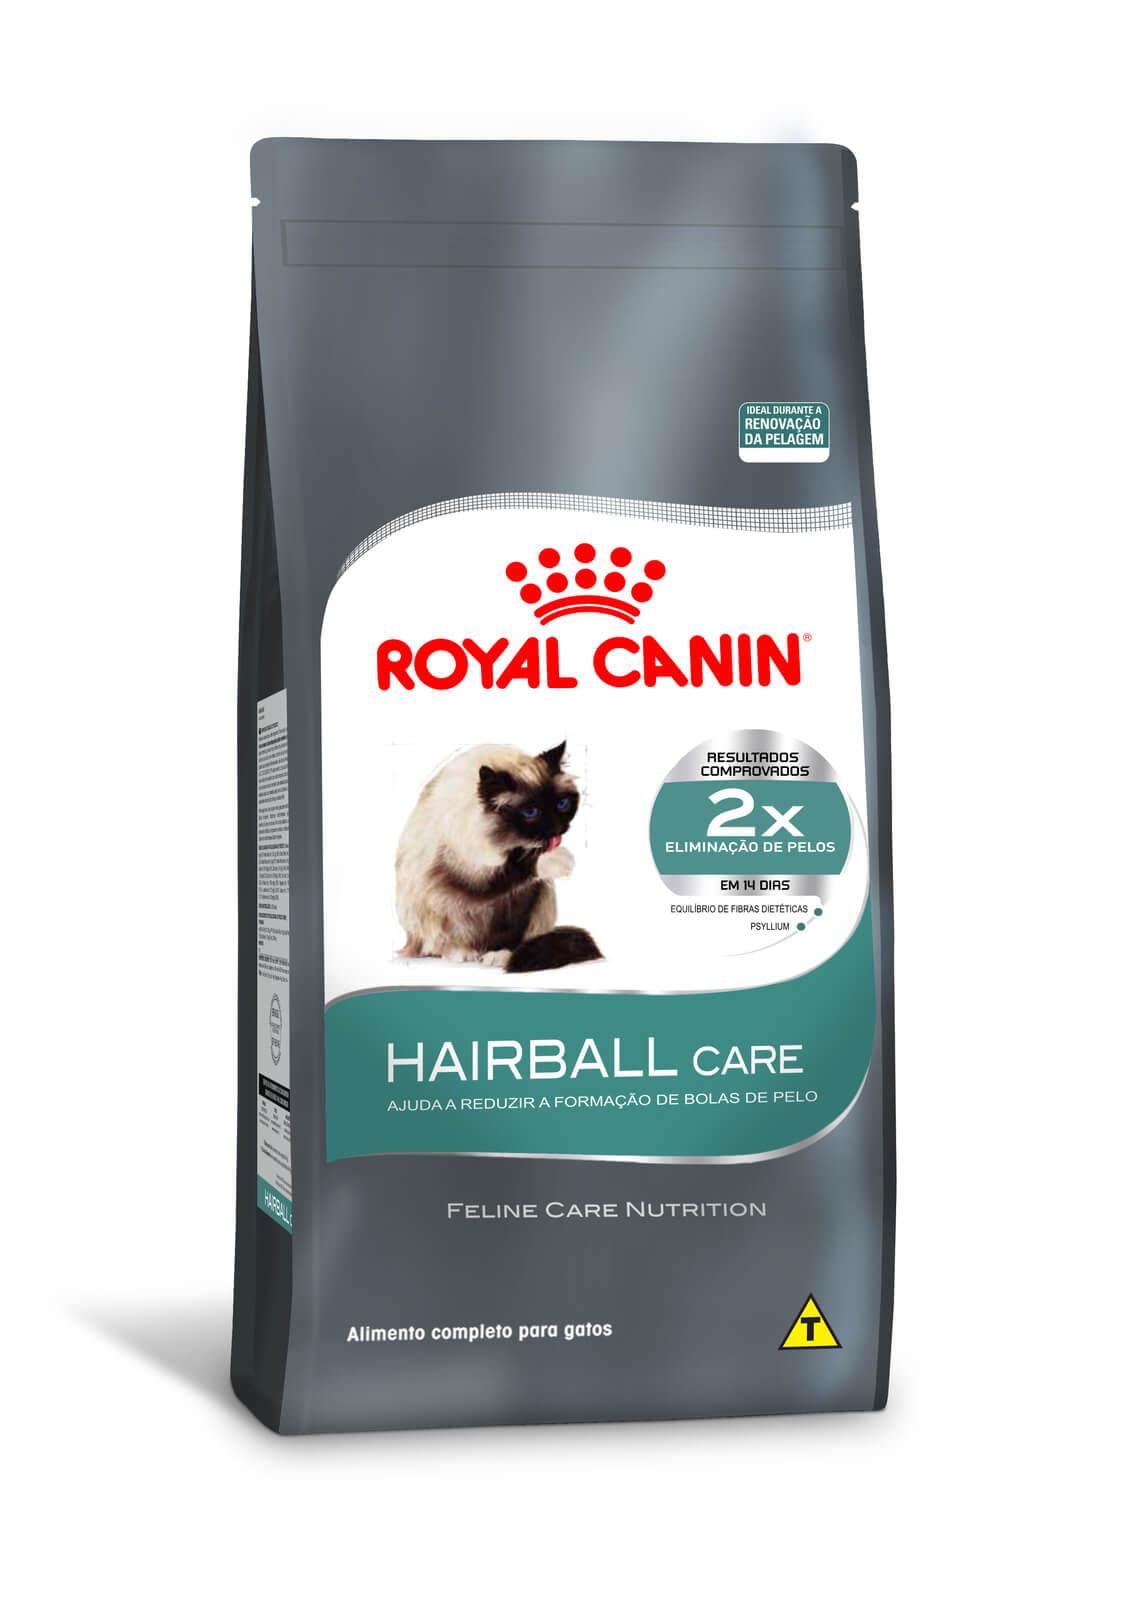 Ração Royal Canin HairBall Care - Gatos Adultos - 1,5 kg